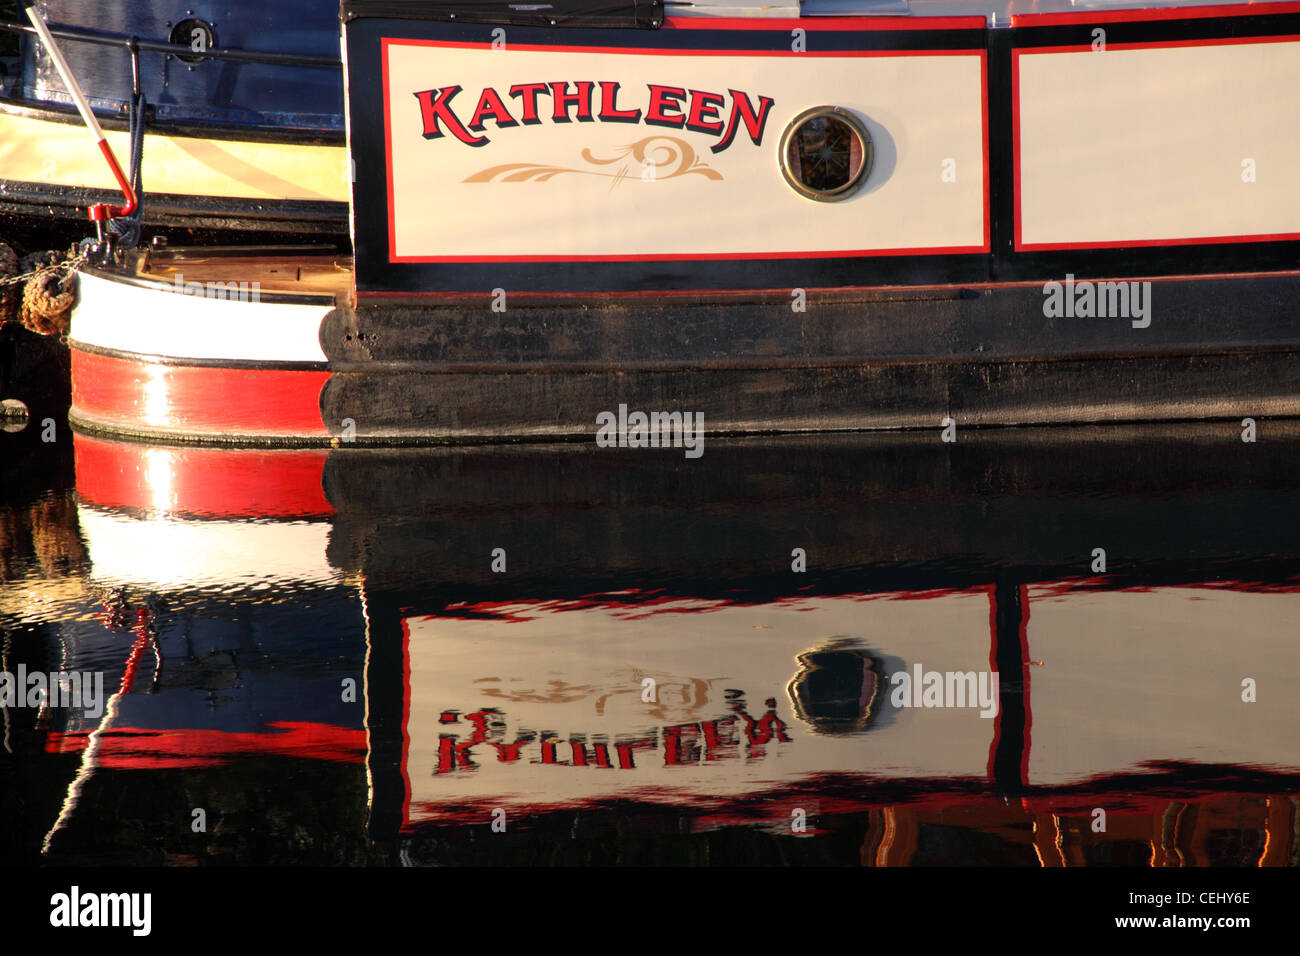 Narrowboat Kathleen in the River Avon, near Bidford on Avon. - Stock Image